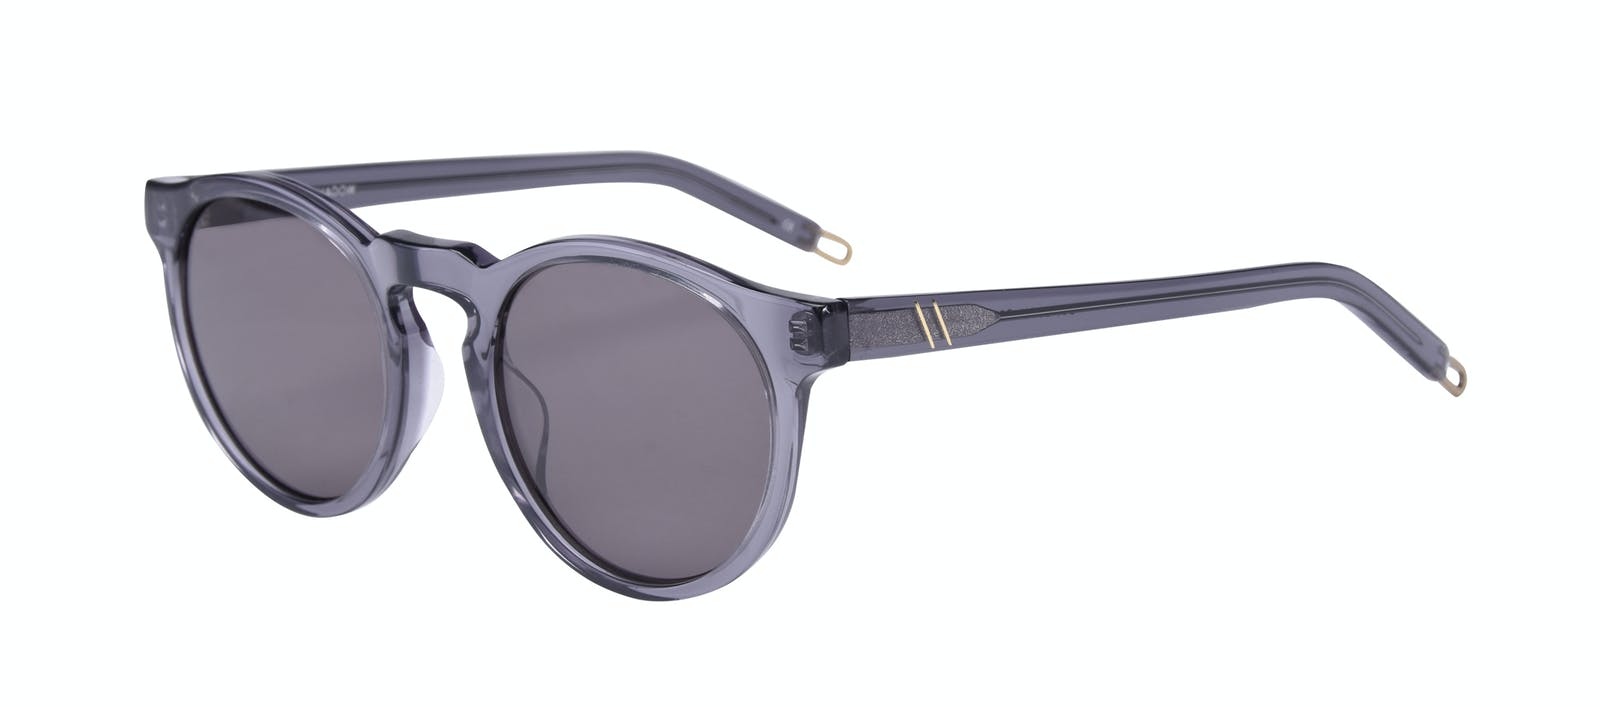 6fdeea5a971 Affordable Fashion Glasses Round Sunglasses Men Ace Shadow Tilt